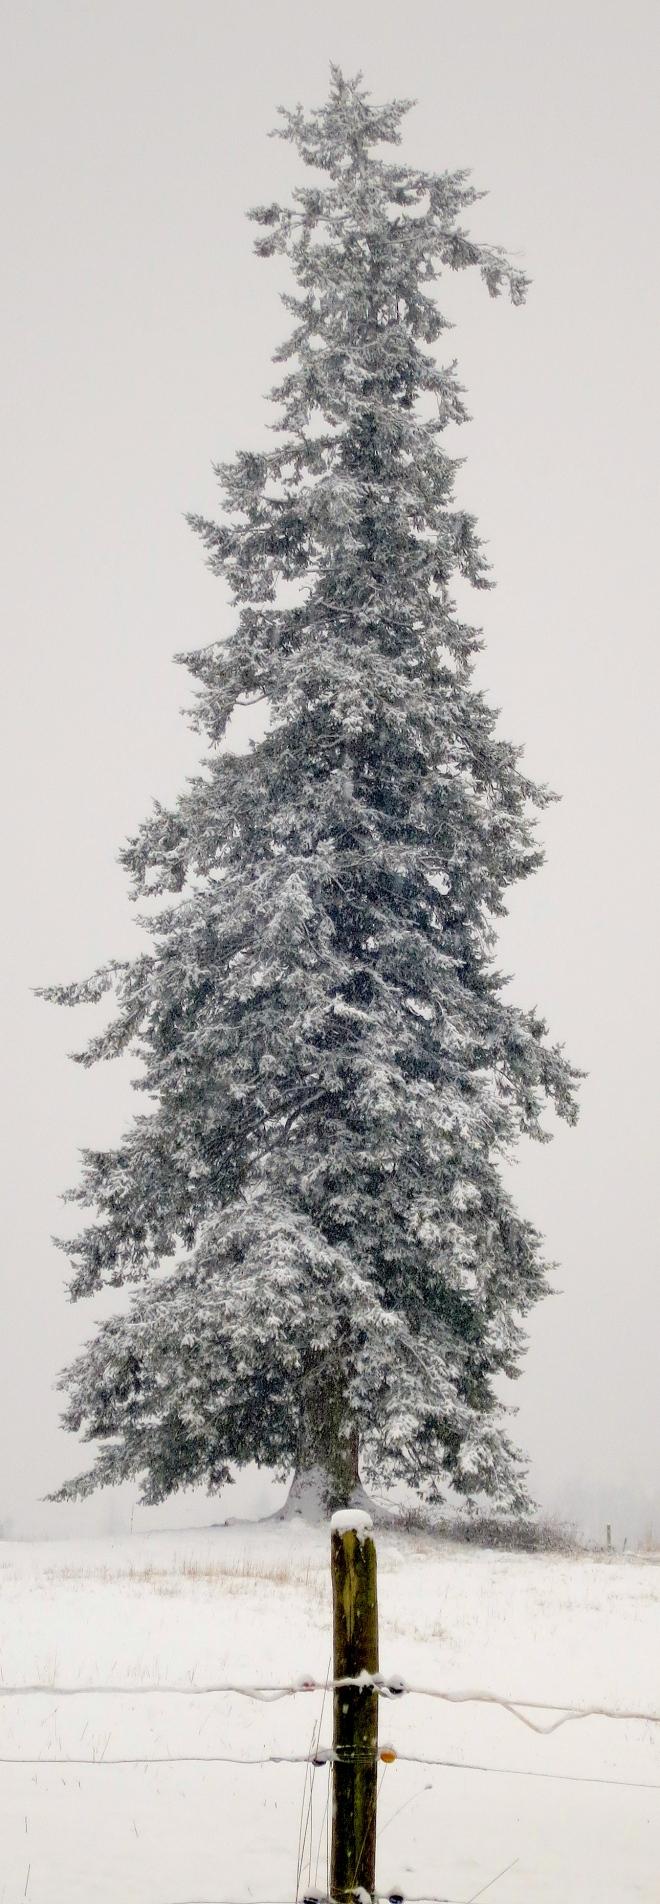 snow12201324